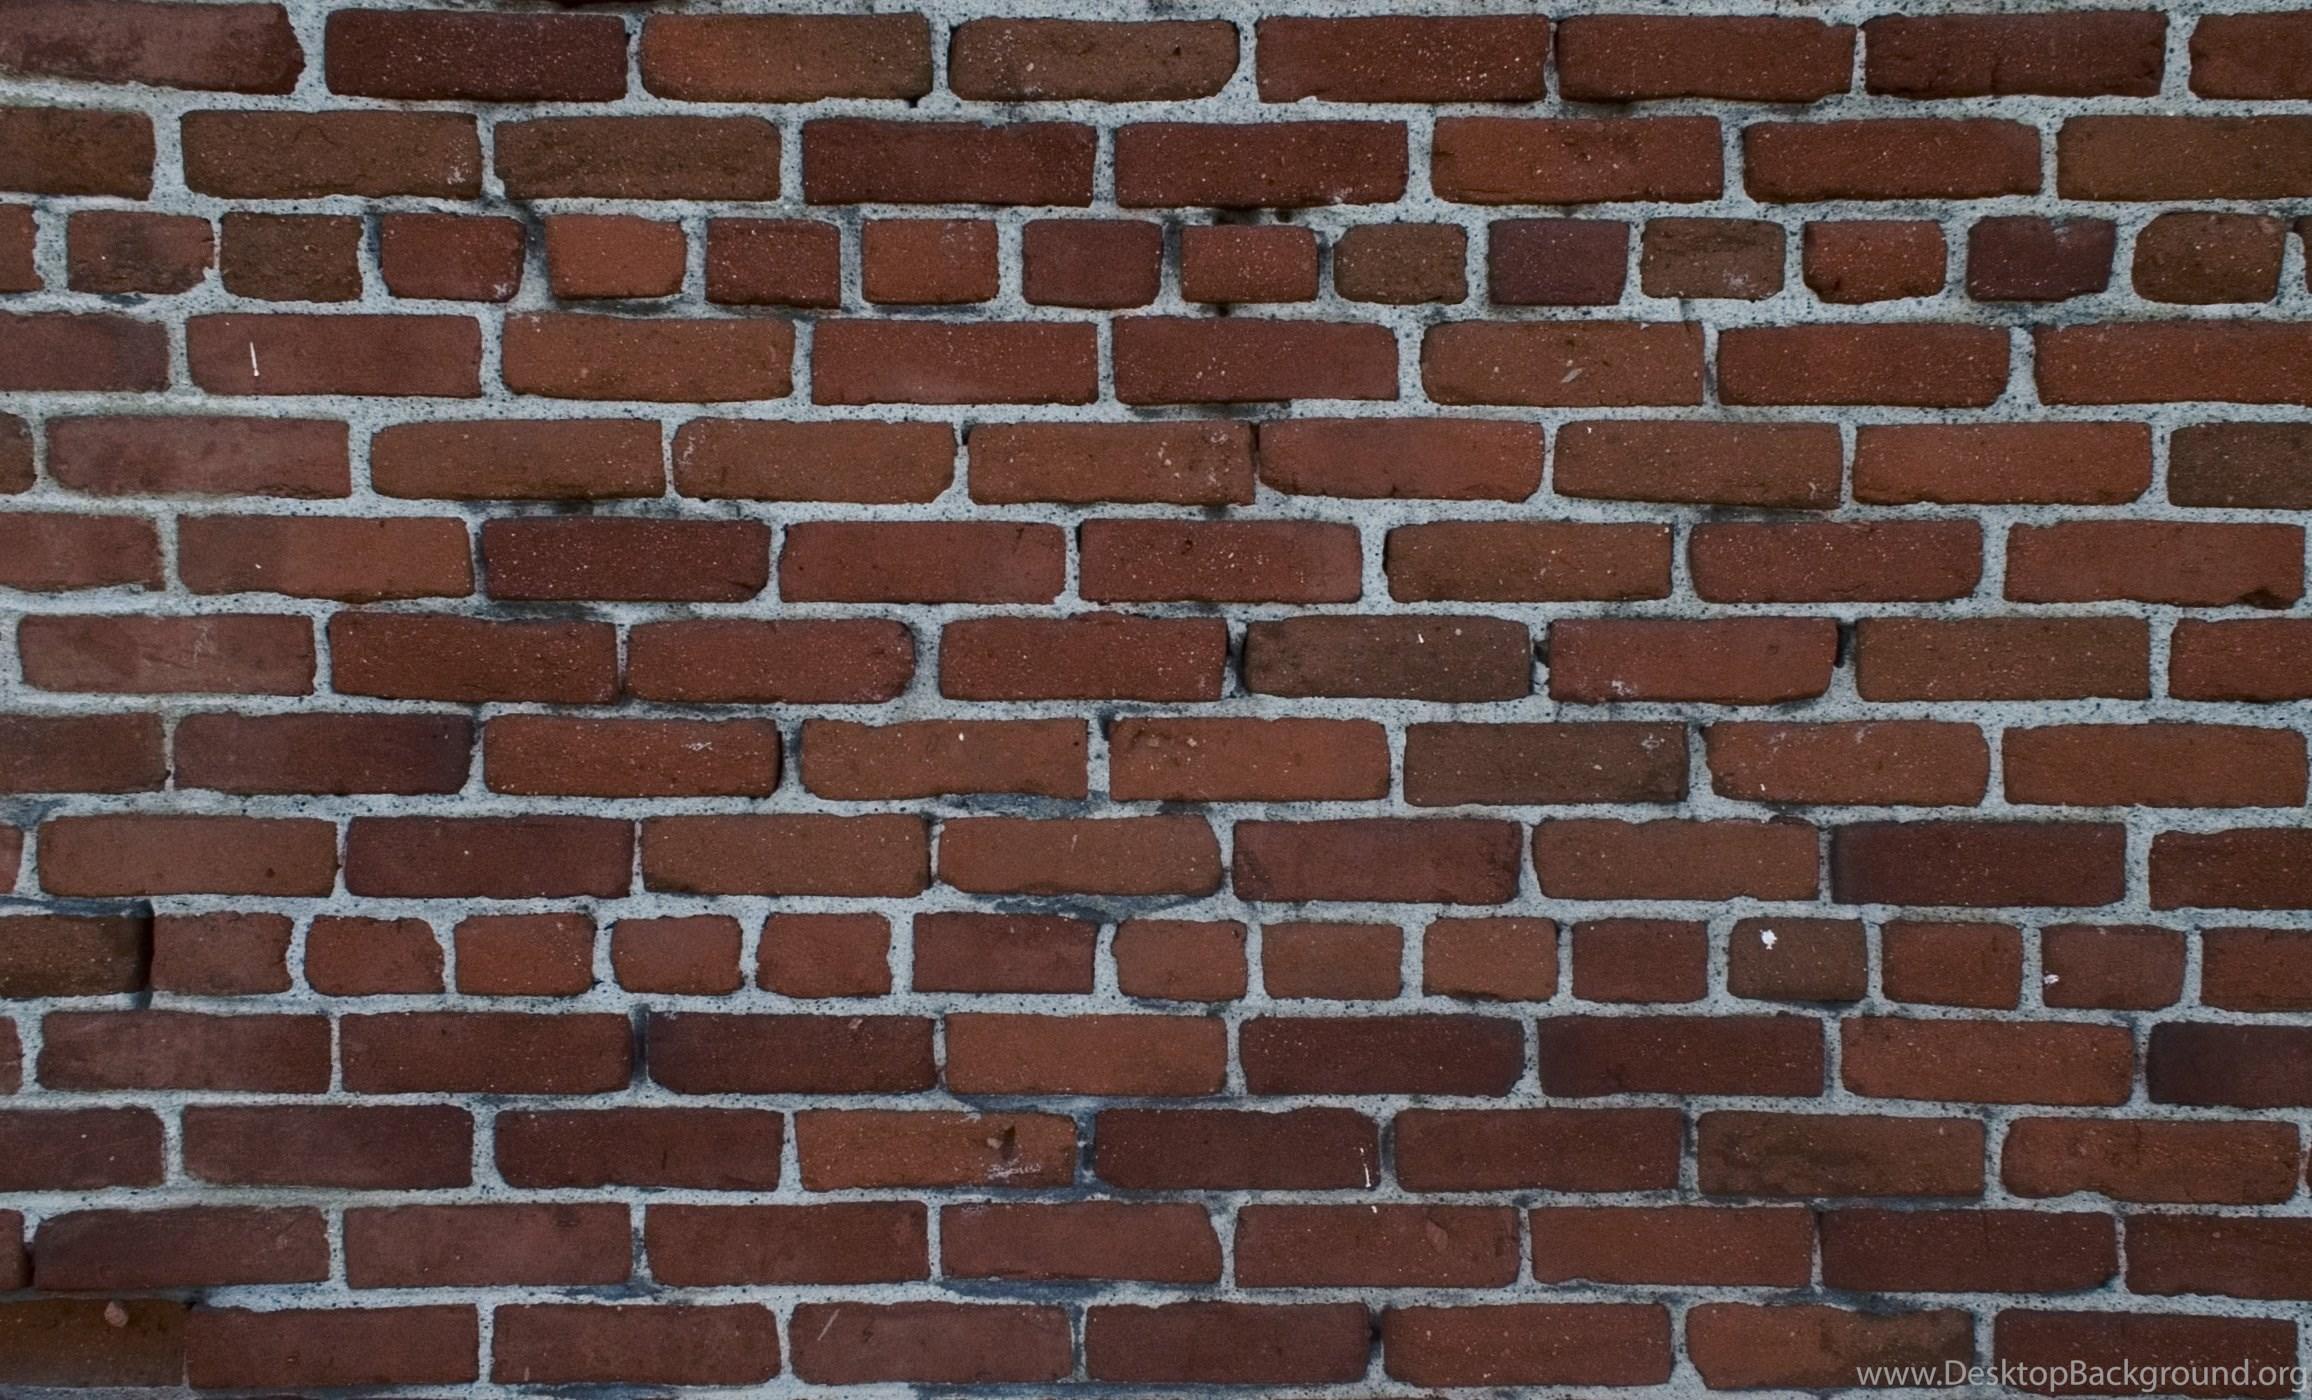 Bricks Brick Wall Textures Wall Wallpapers ( Desktop